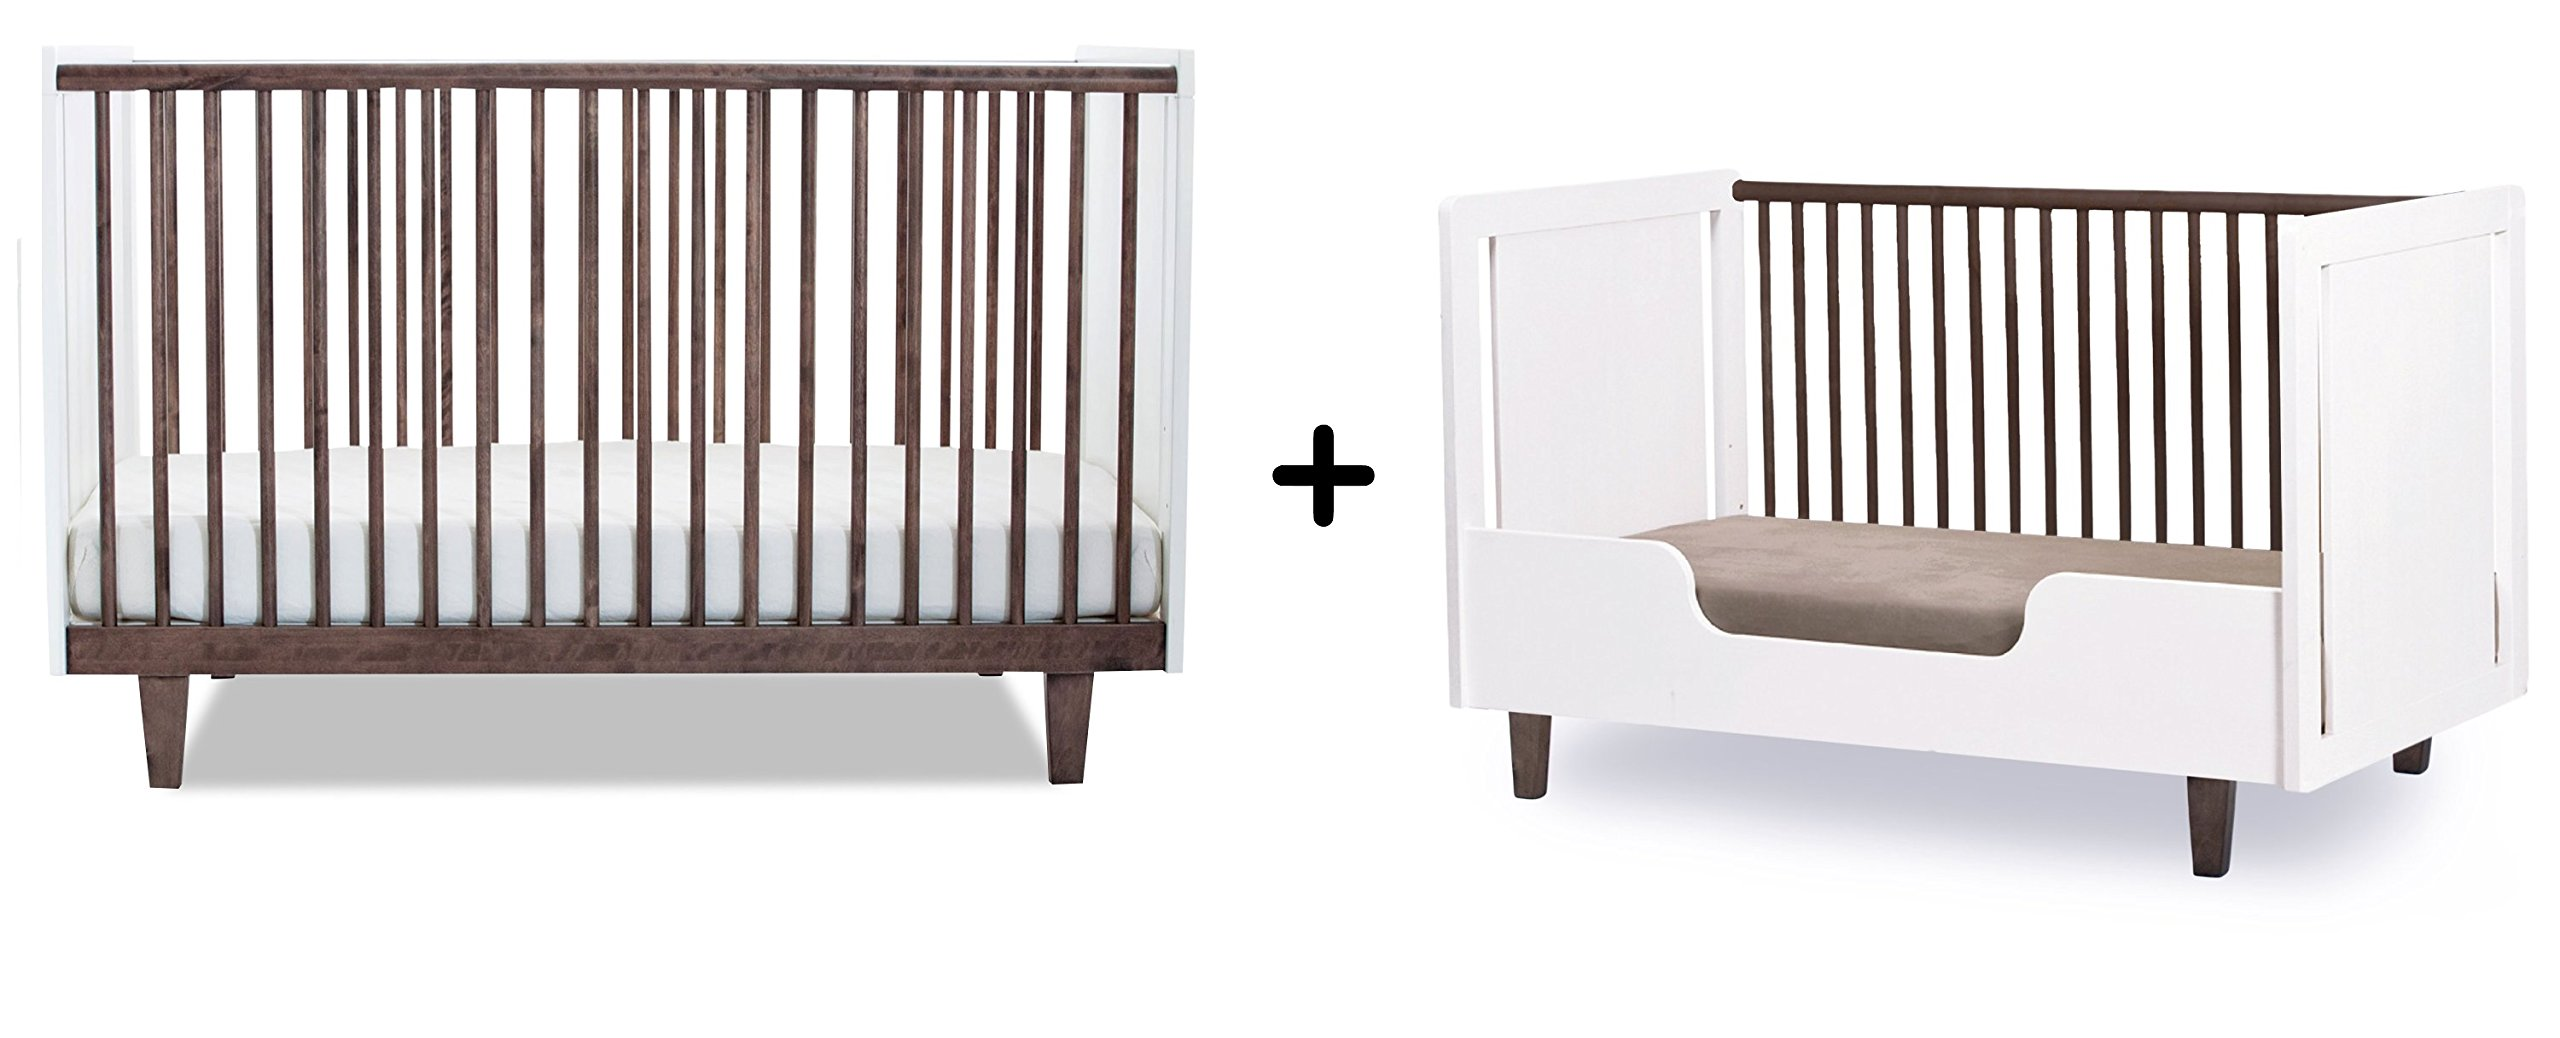 Oeuf Rhea Crib, Walnut/White + Oeuf Rhea Conversion Kit, White Complete Set